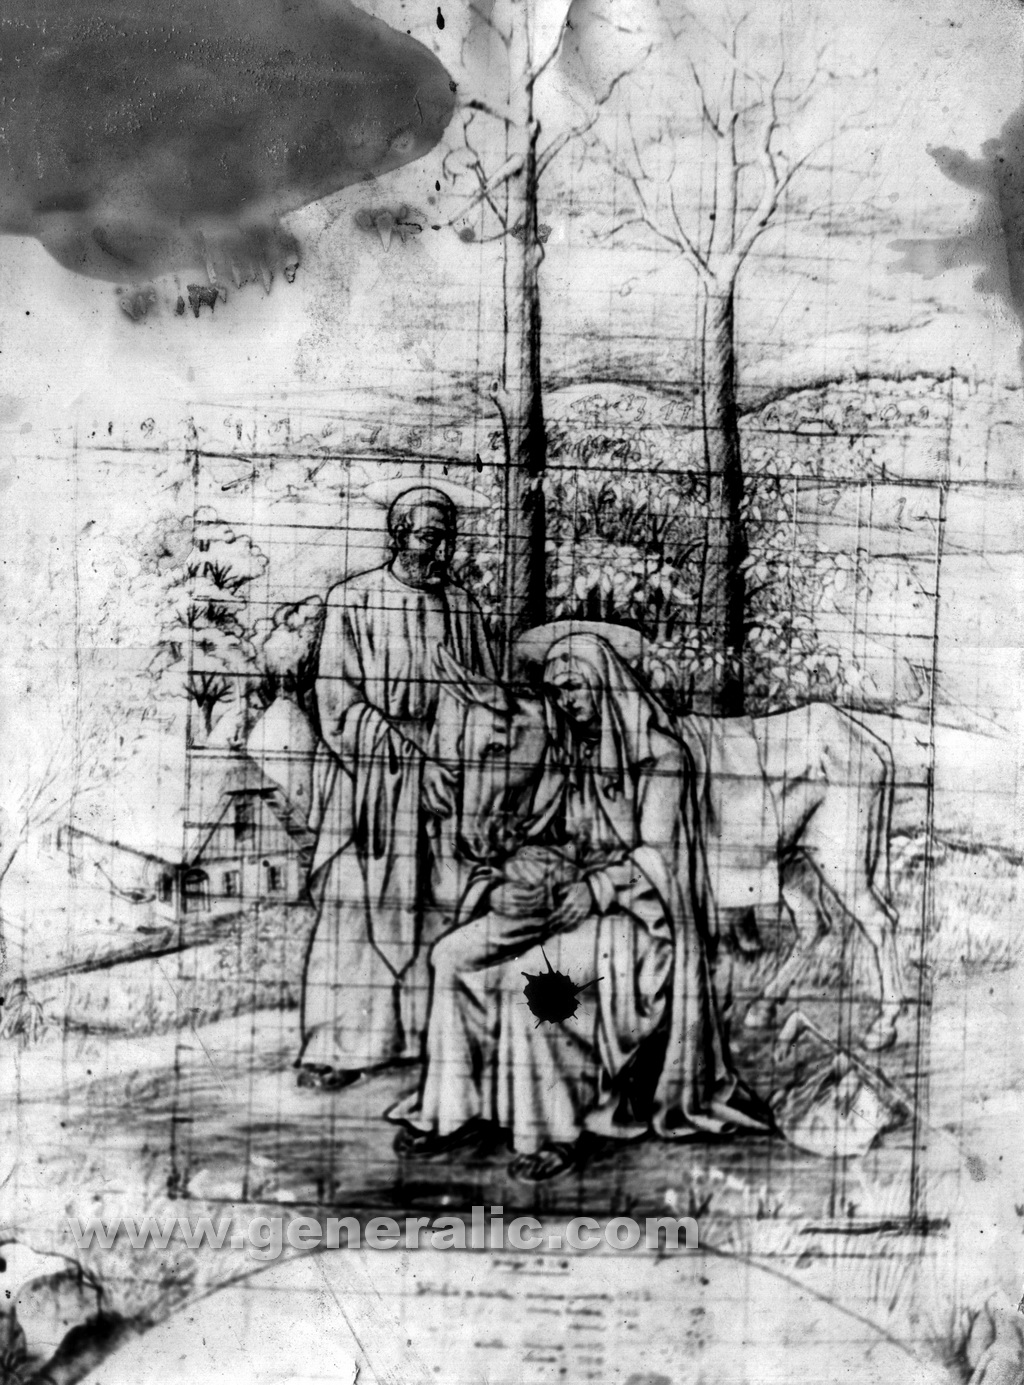 Ivan Generalic, 1943, Flight into Egypt, pencil on paper (landscape only)